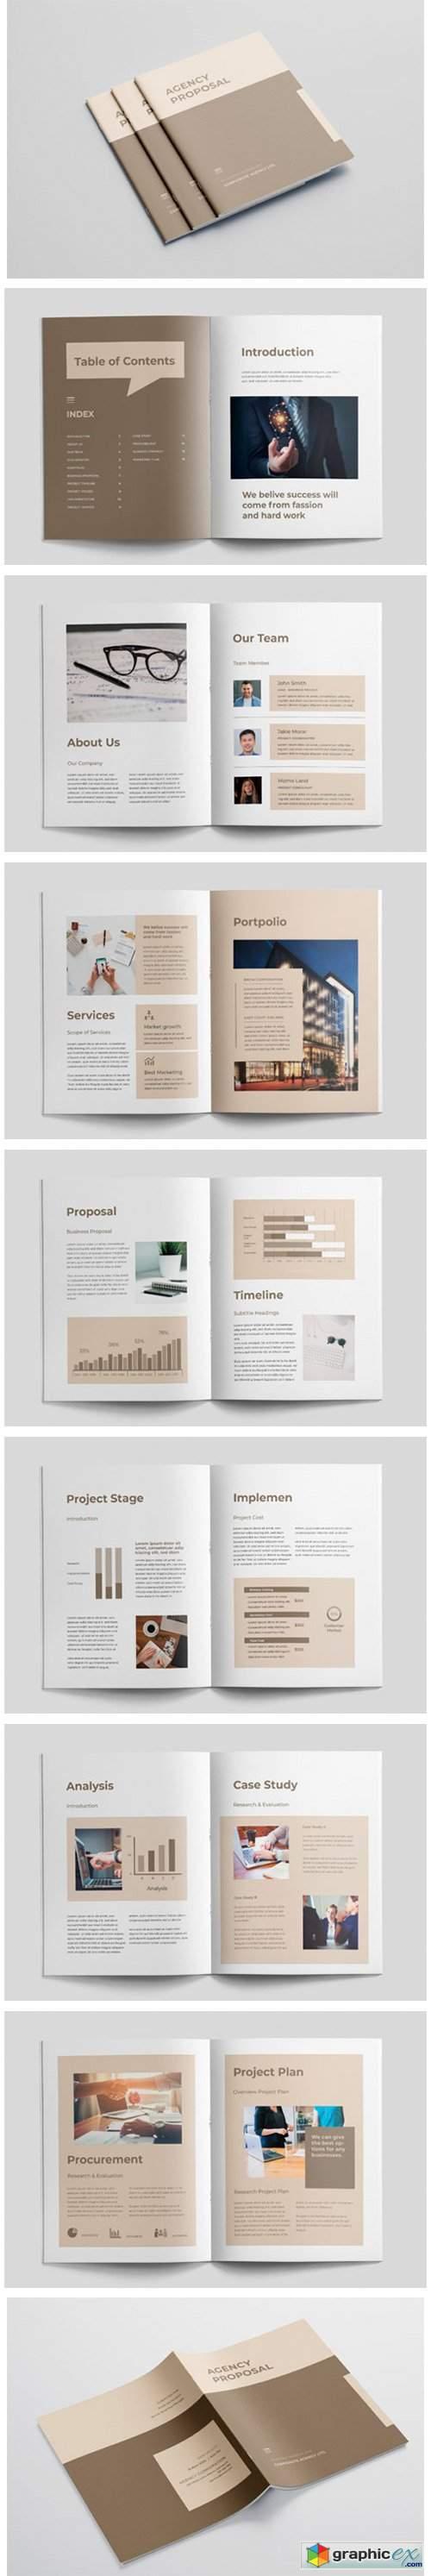 Agency Proposal Design